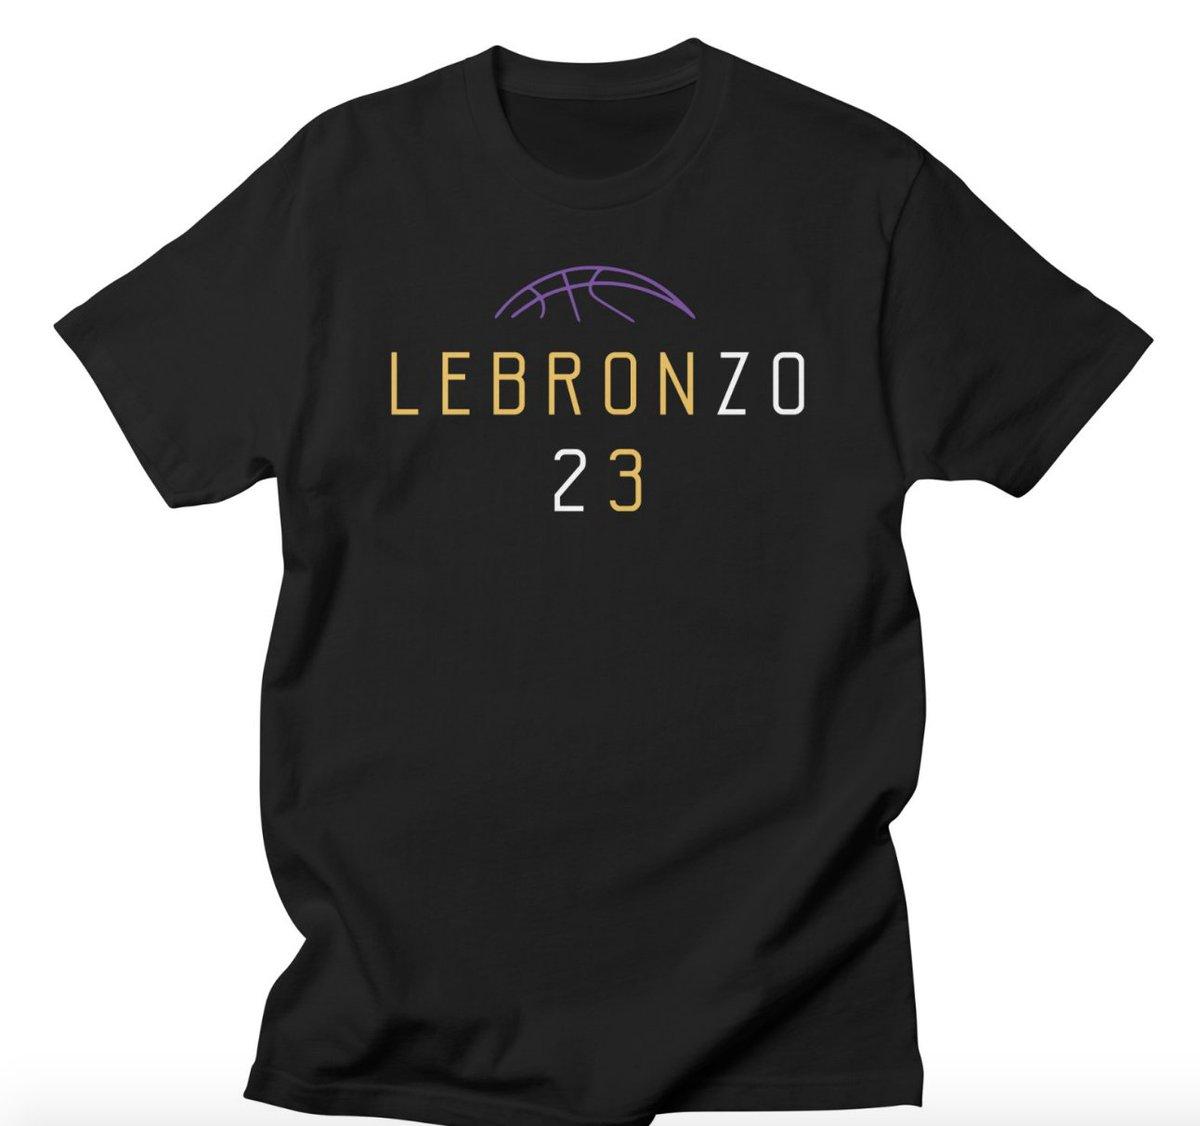 Lonzo & LeBron did that! https://t.co/cPySU0rZjZ